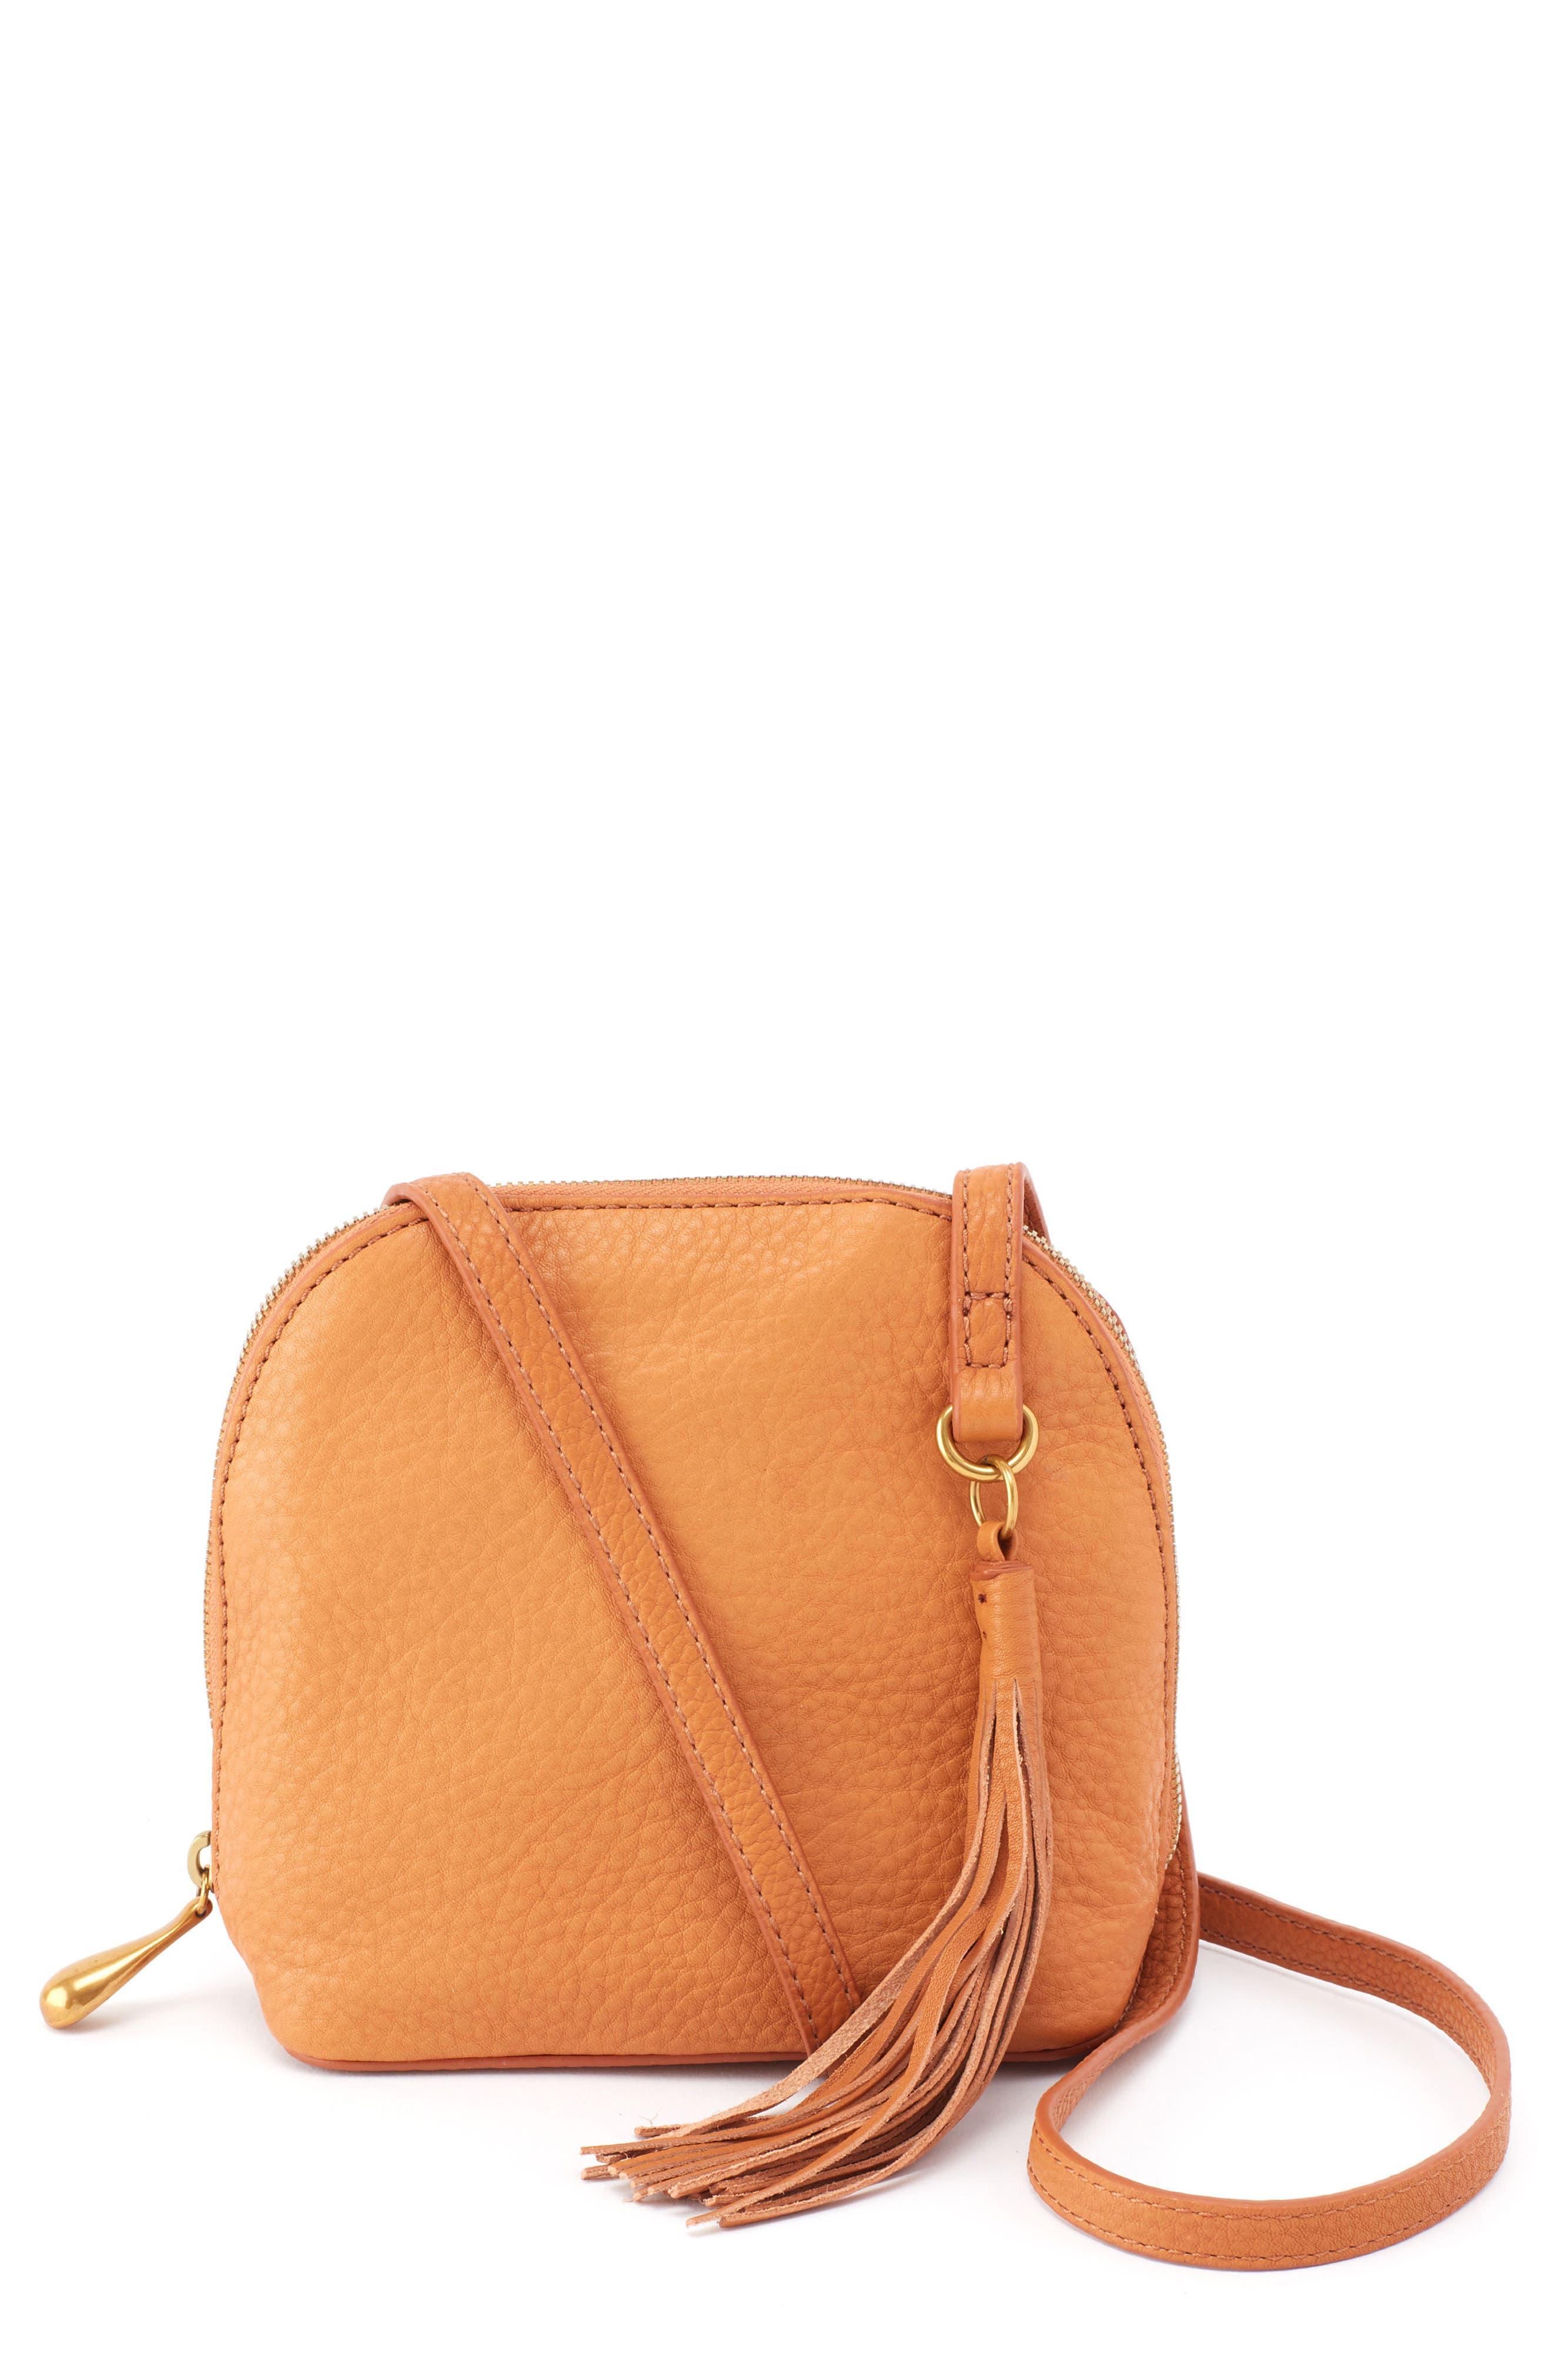 Nash Calfskin Leather Crossbody Bag, Main, color, WHISKEY